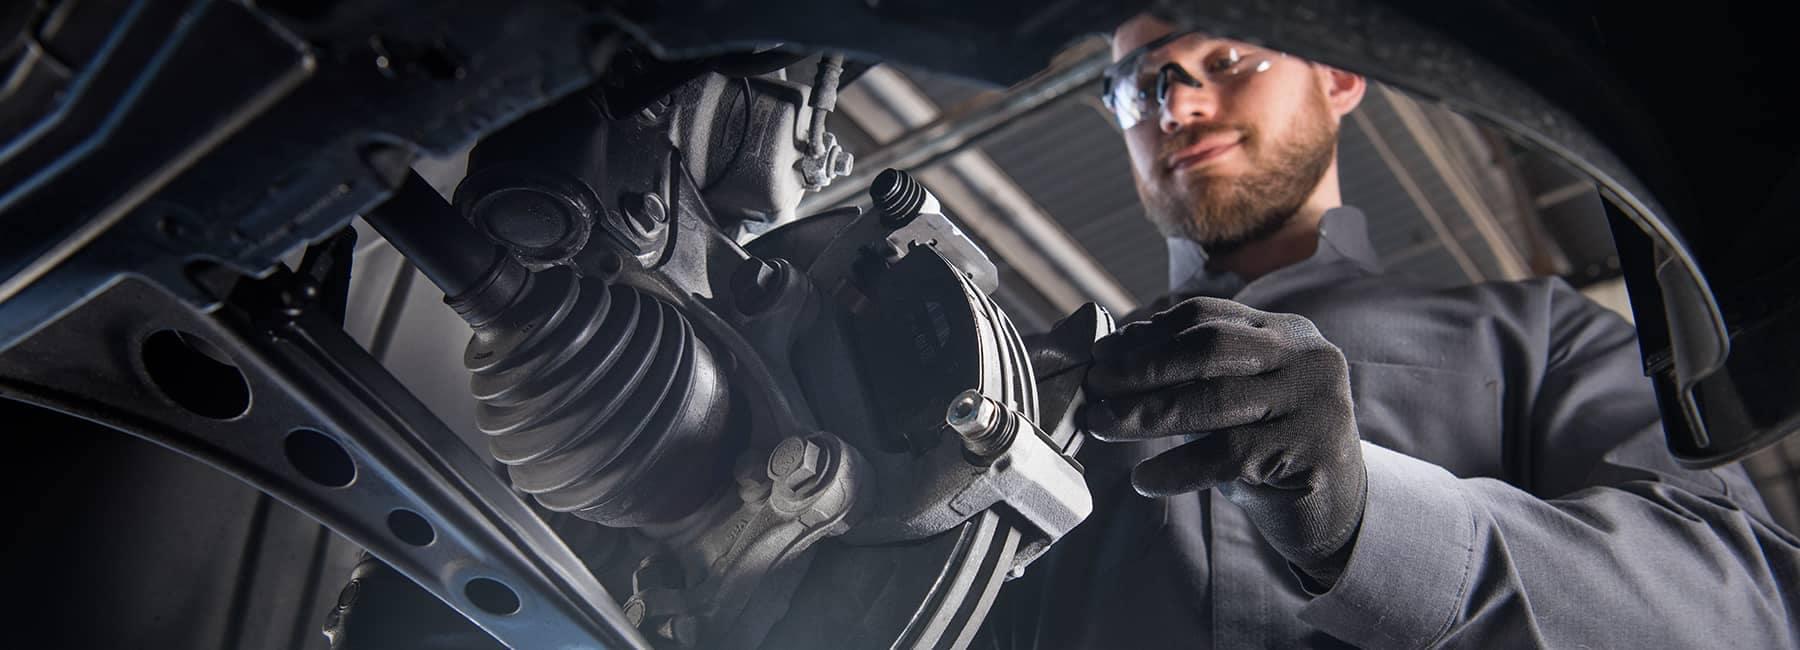 GM Certified Service Technician Brake Replacement